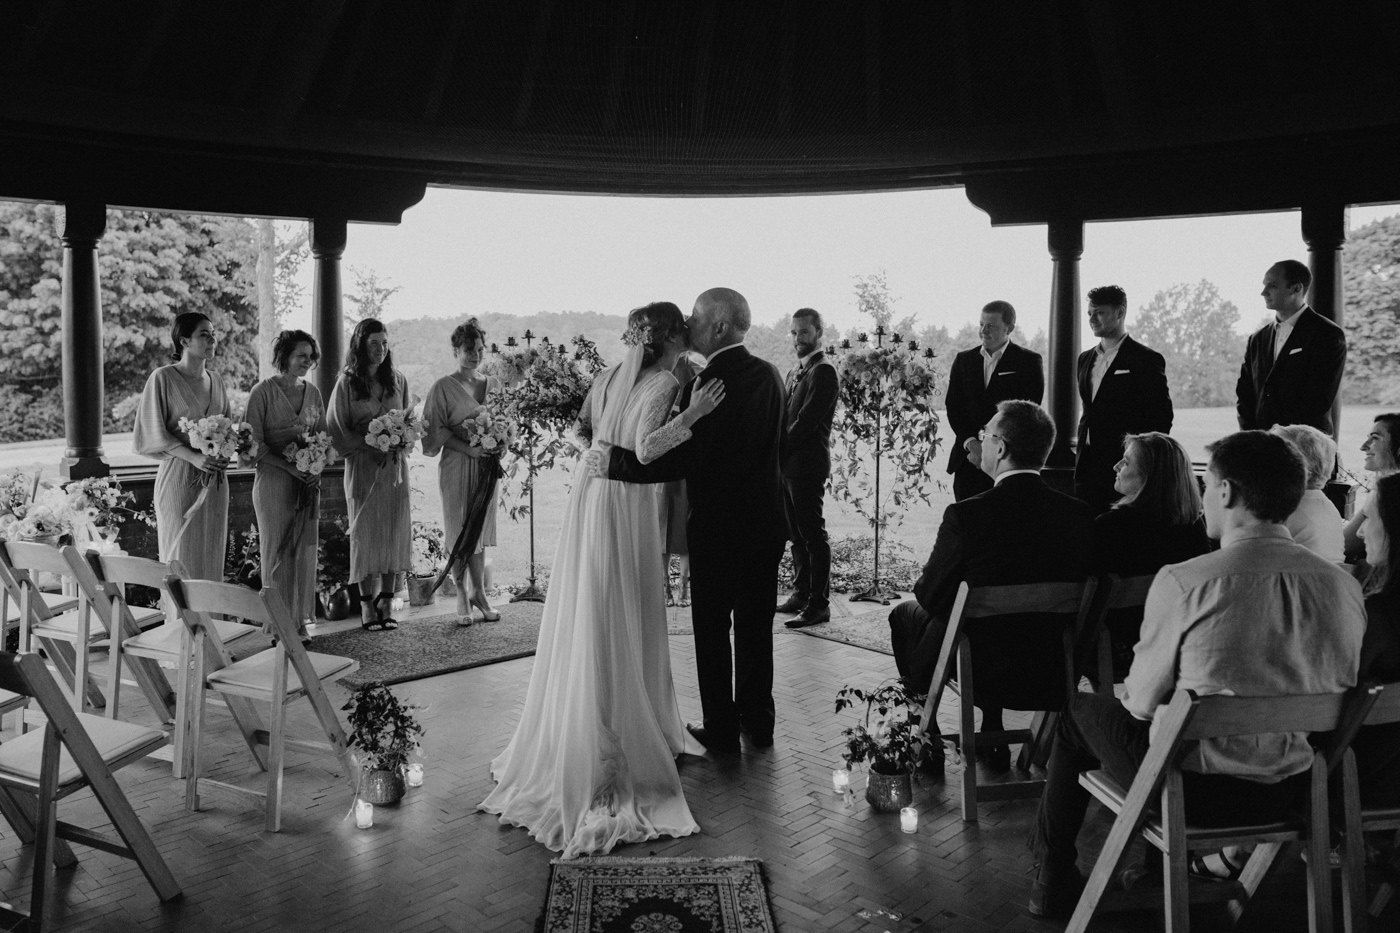 Erin-Mike-Intimate-Vintage-Wedding-Shelburne-Farms-Vermont -82.jpg